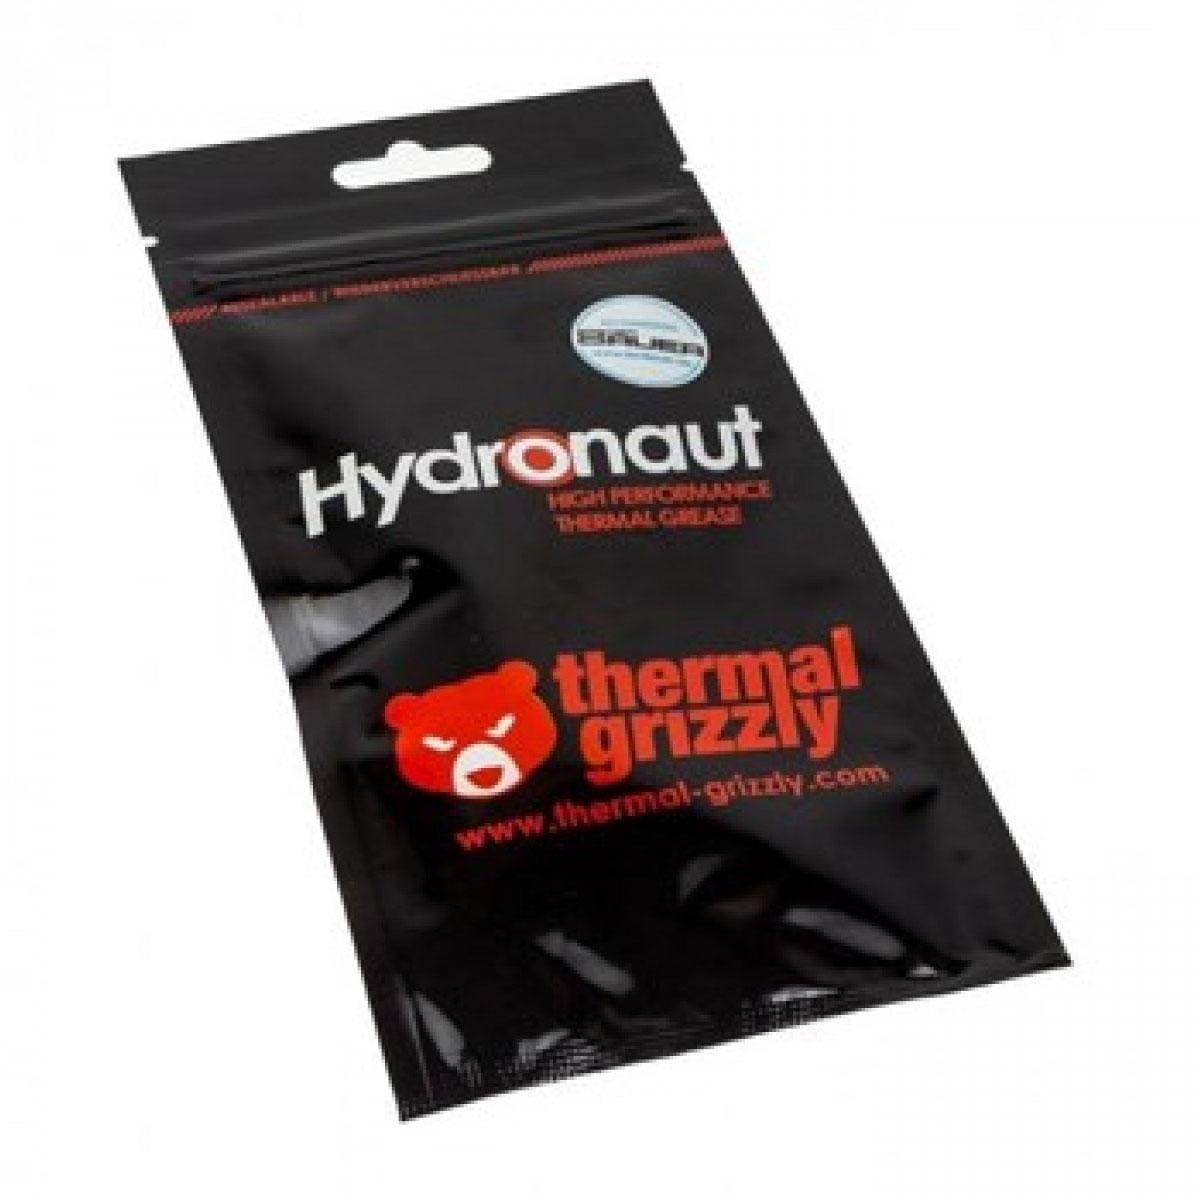 Pasta Térmica Hydronaut 1G Thermal Grizzly 11.8Wmk com Espátula Overclock